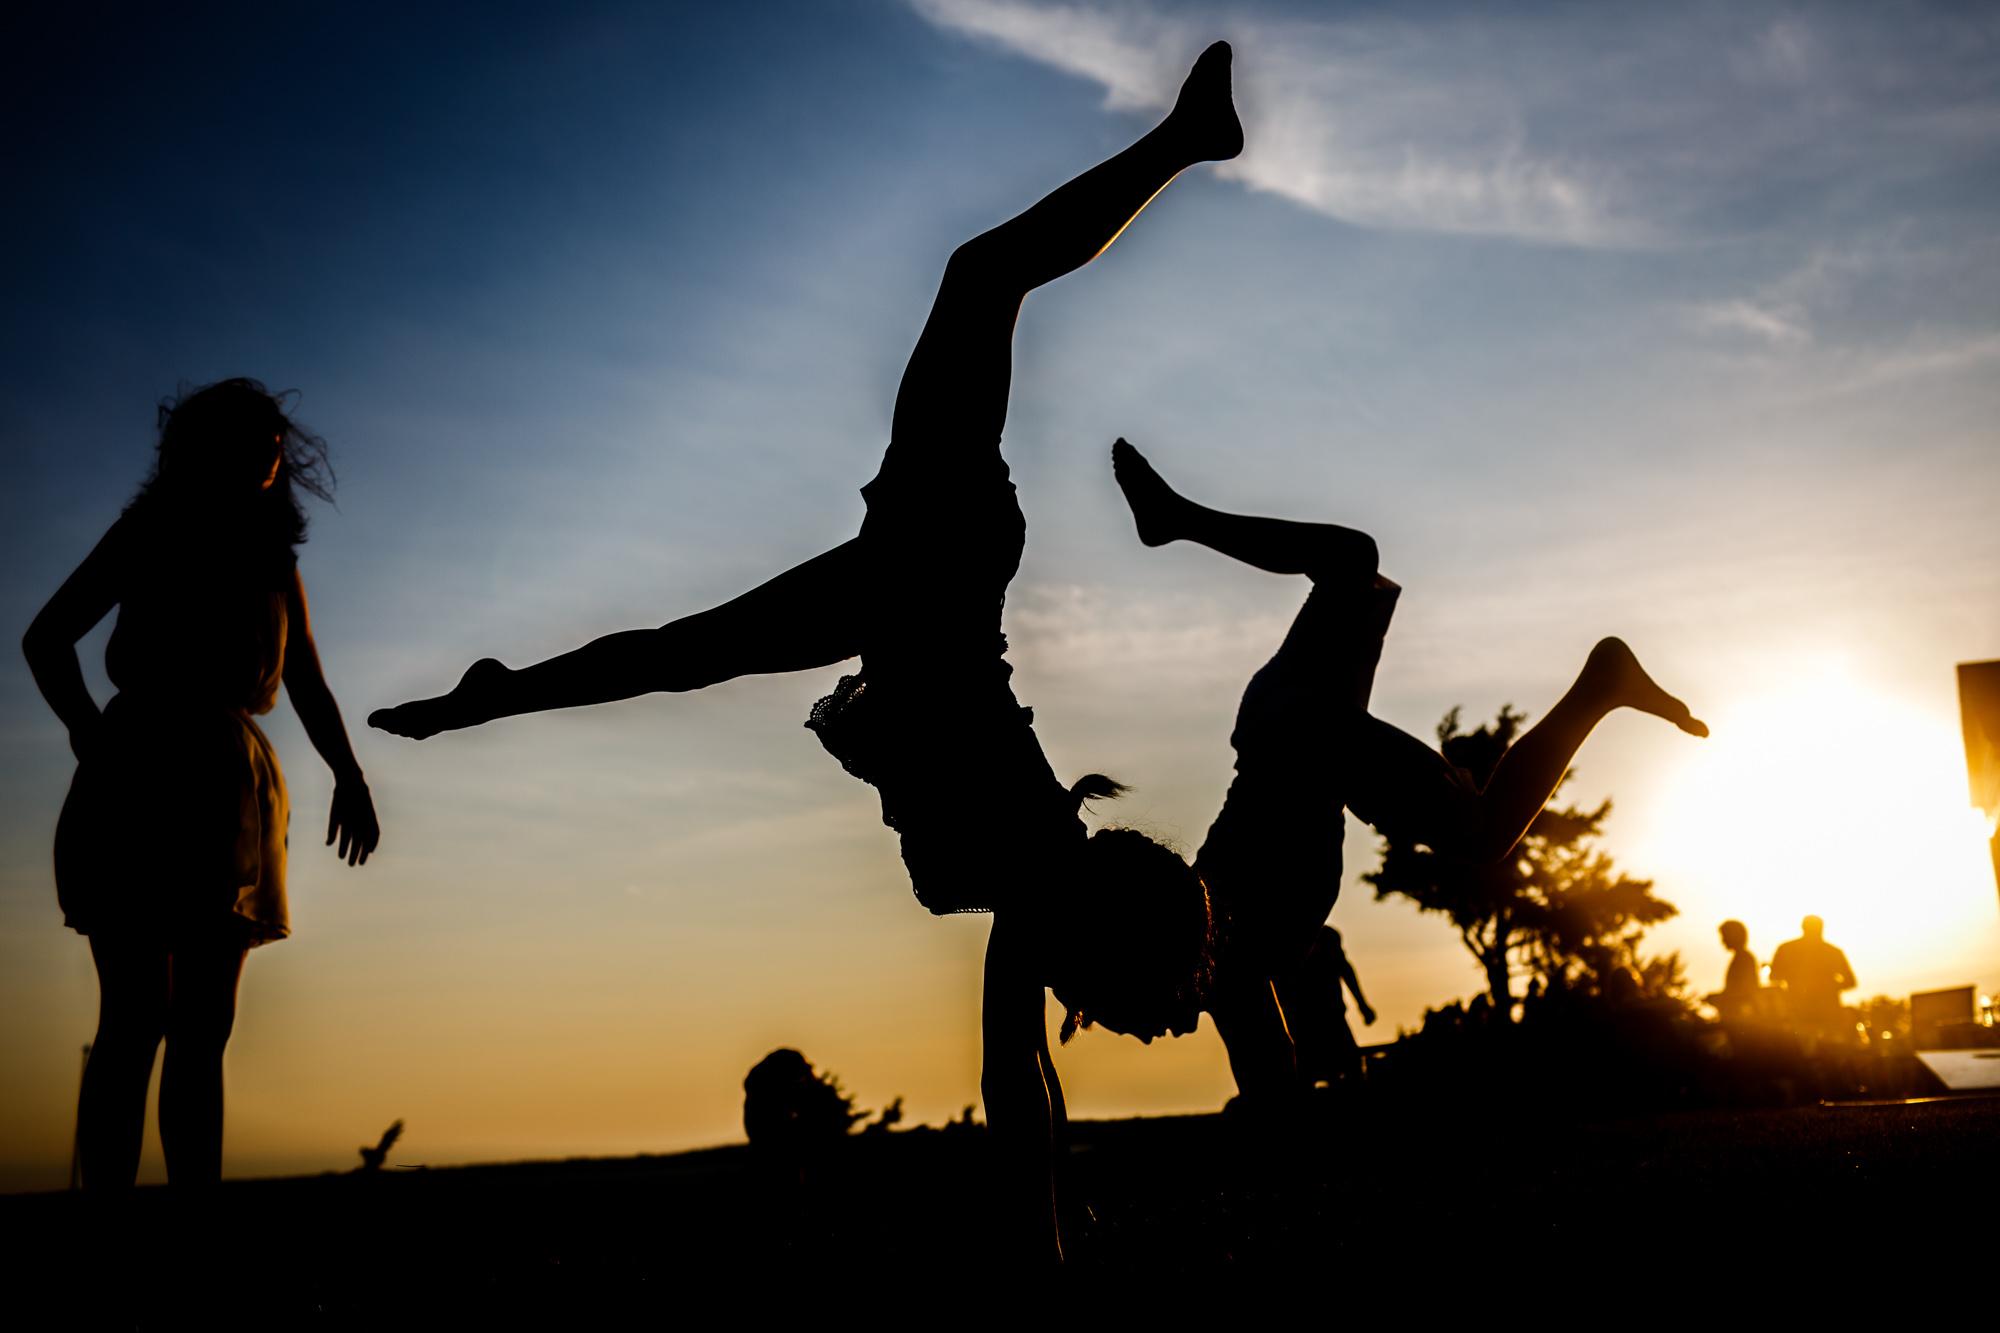 silhouette of kids doing handstands